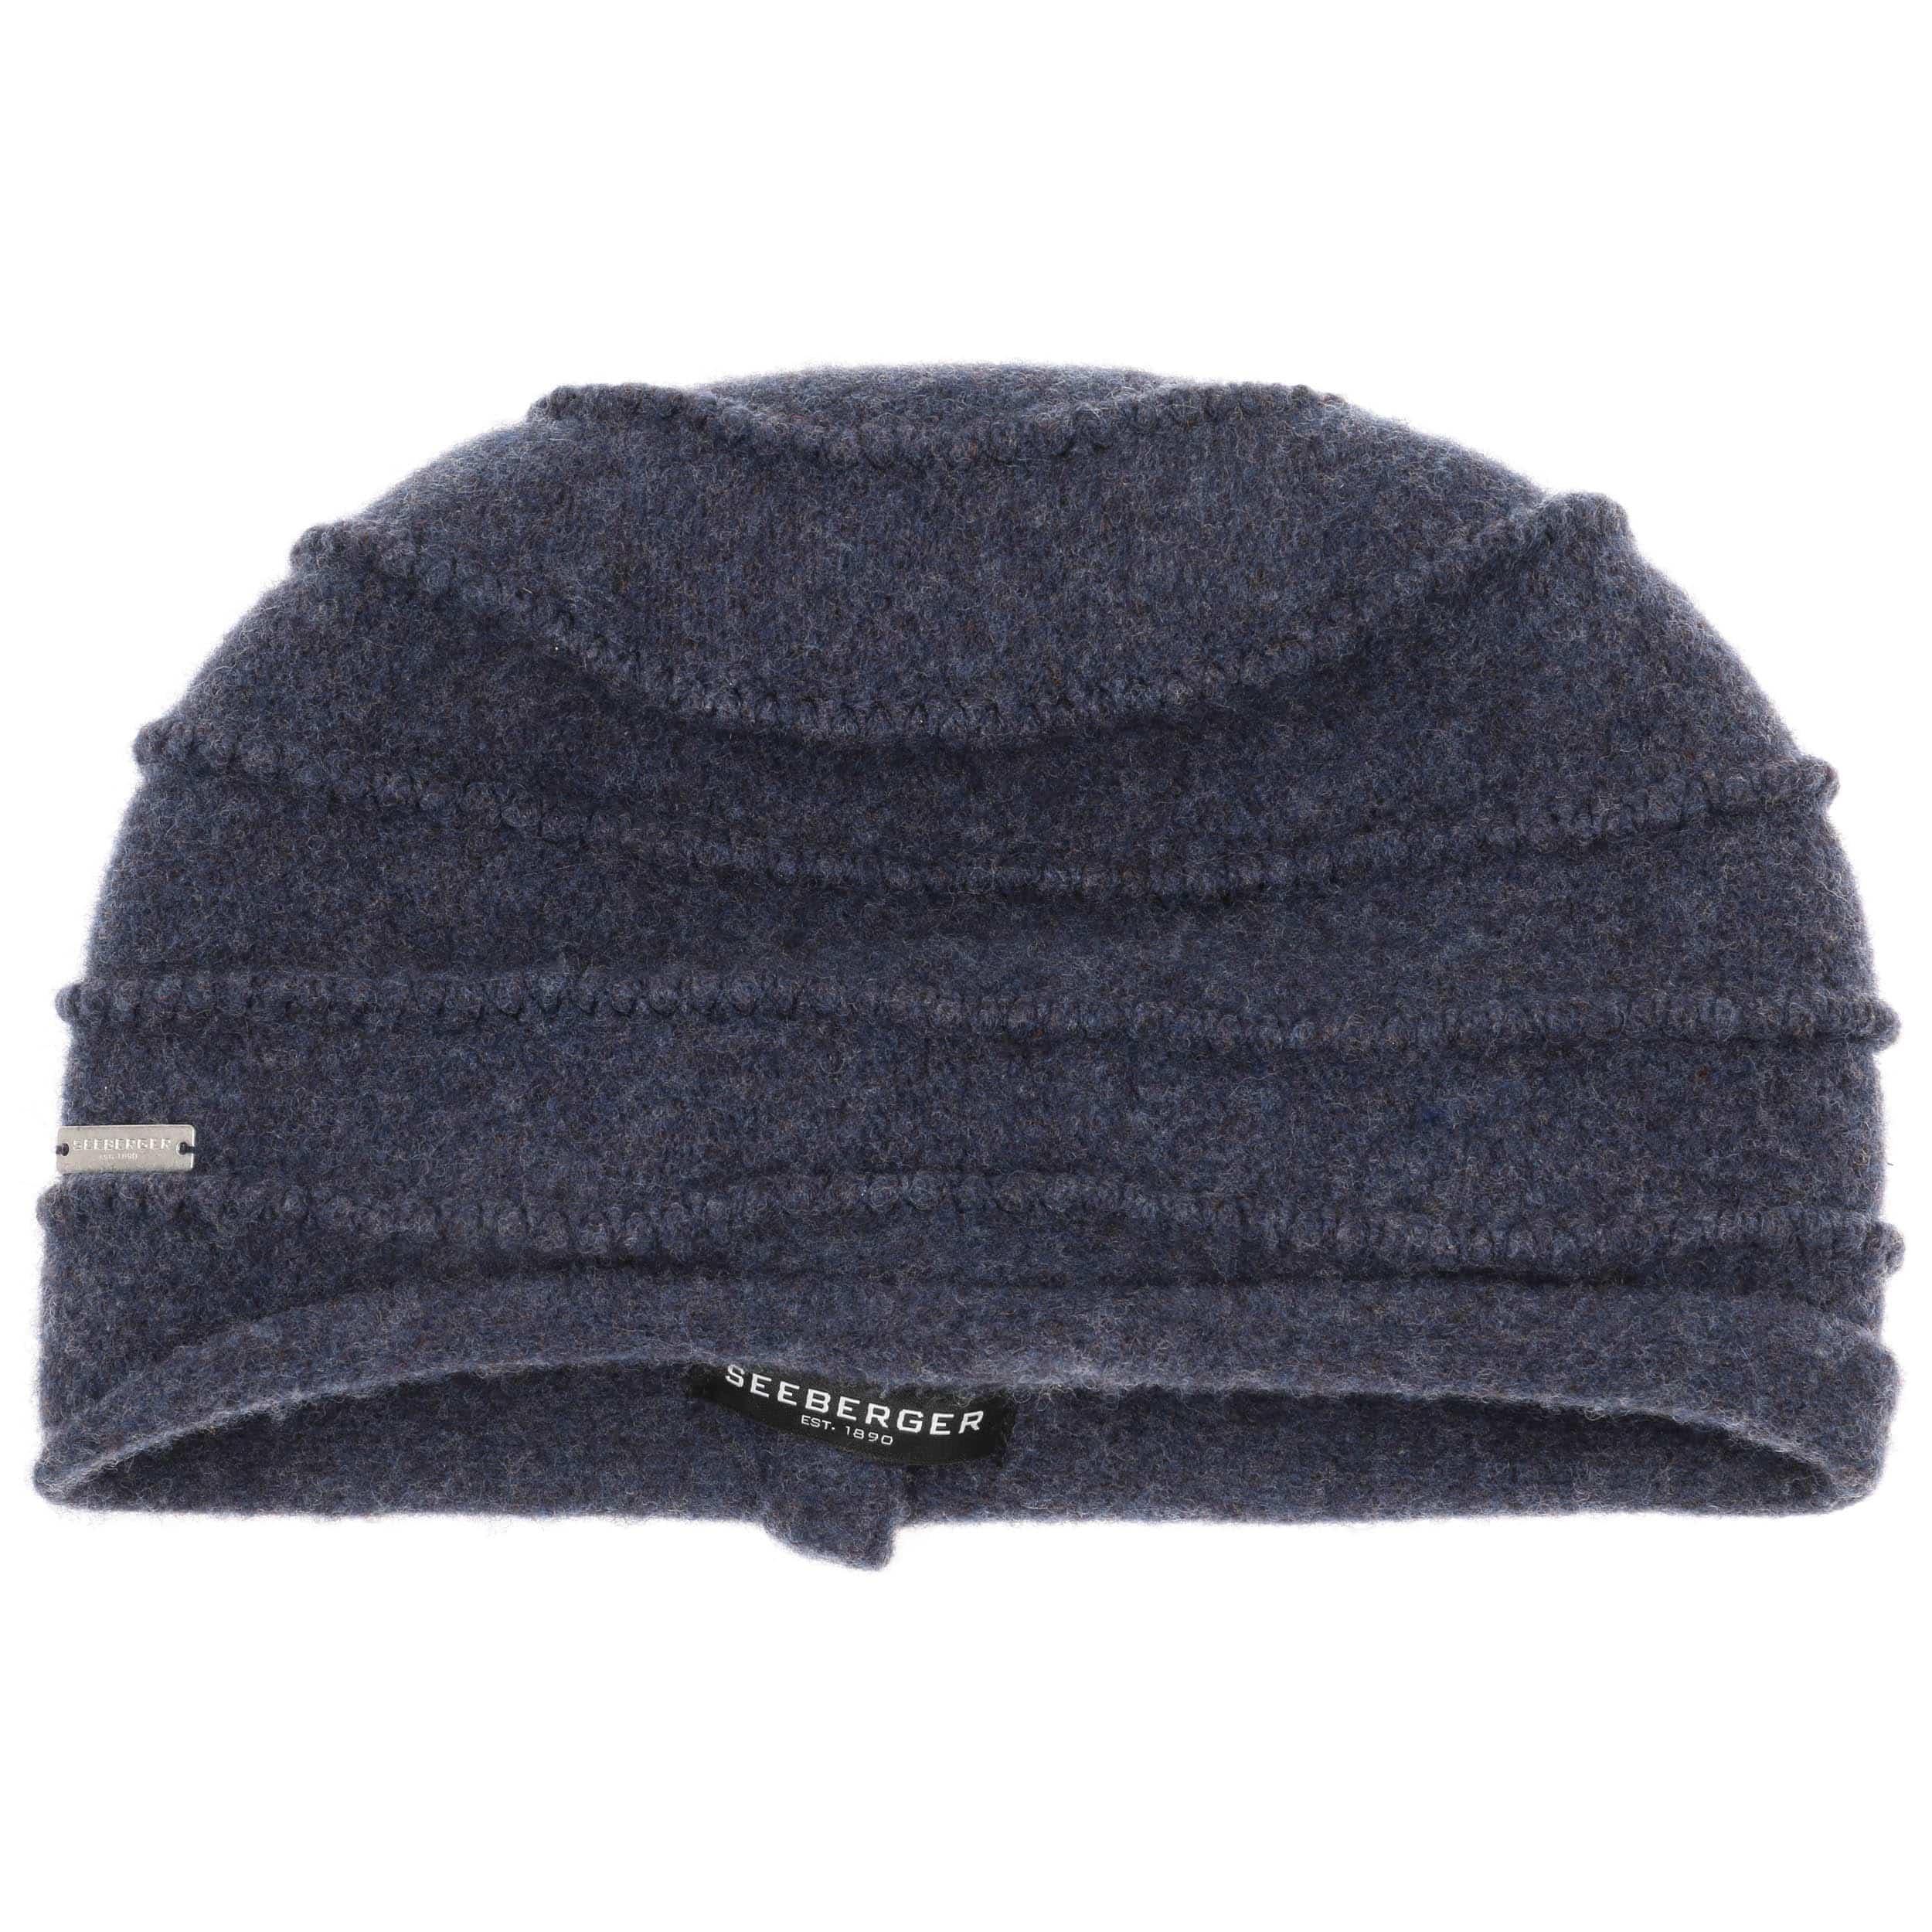 b2b0b854cbe ... Selifa Milled Wool Hat by Seeberger - blue 1 ...